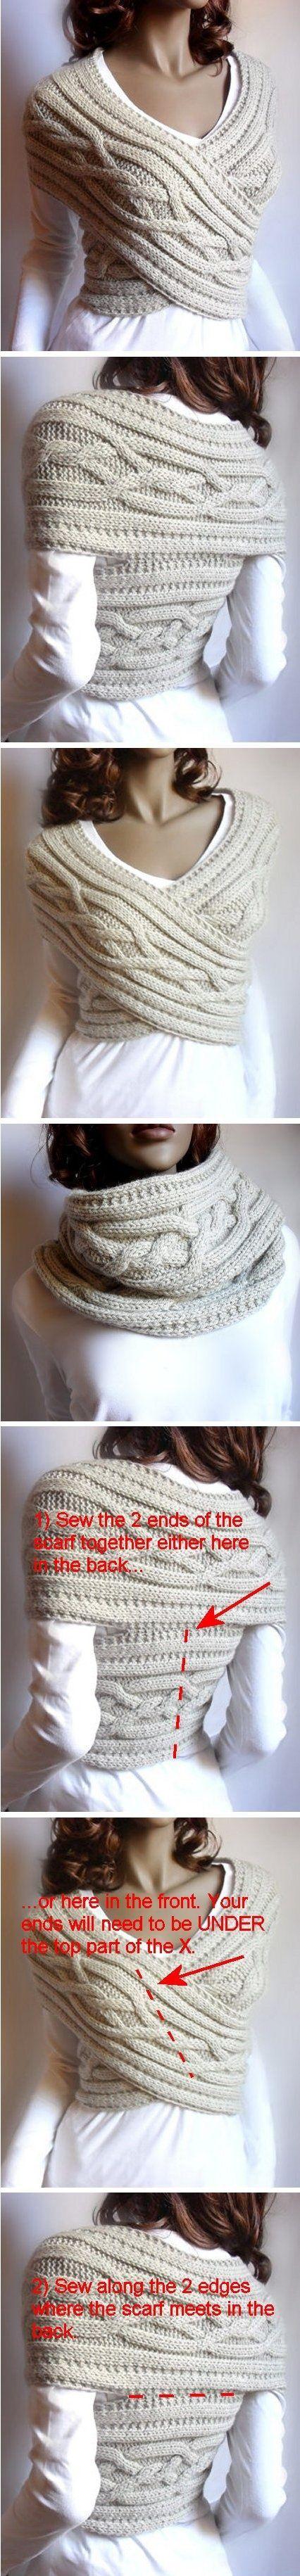 rectangle to wrap | ropa | Pinterest | Cruzado, Lana y Tejido